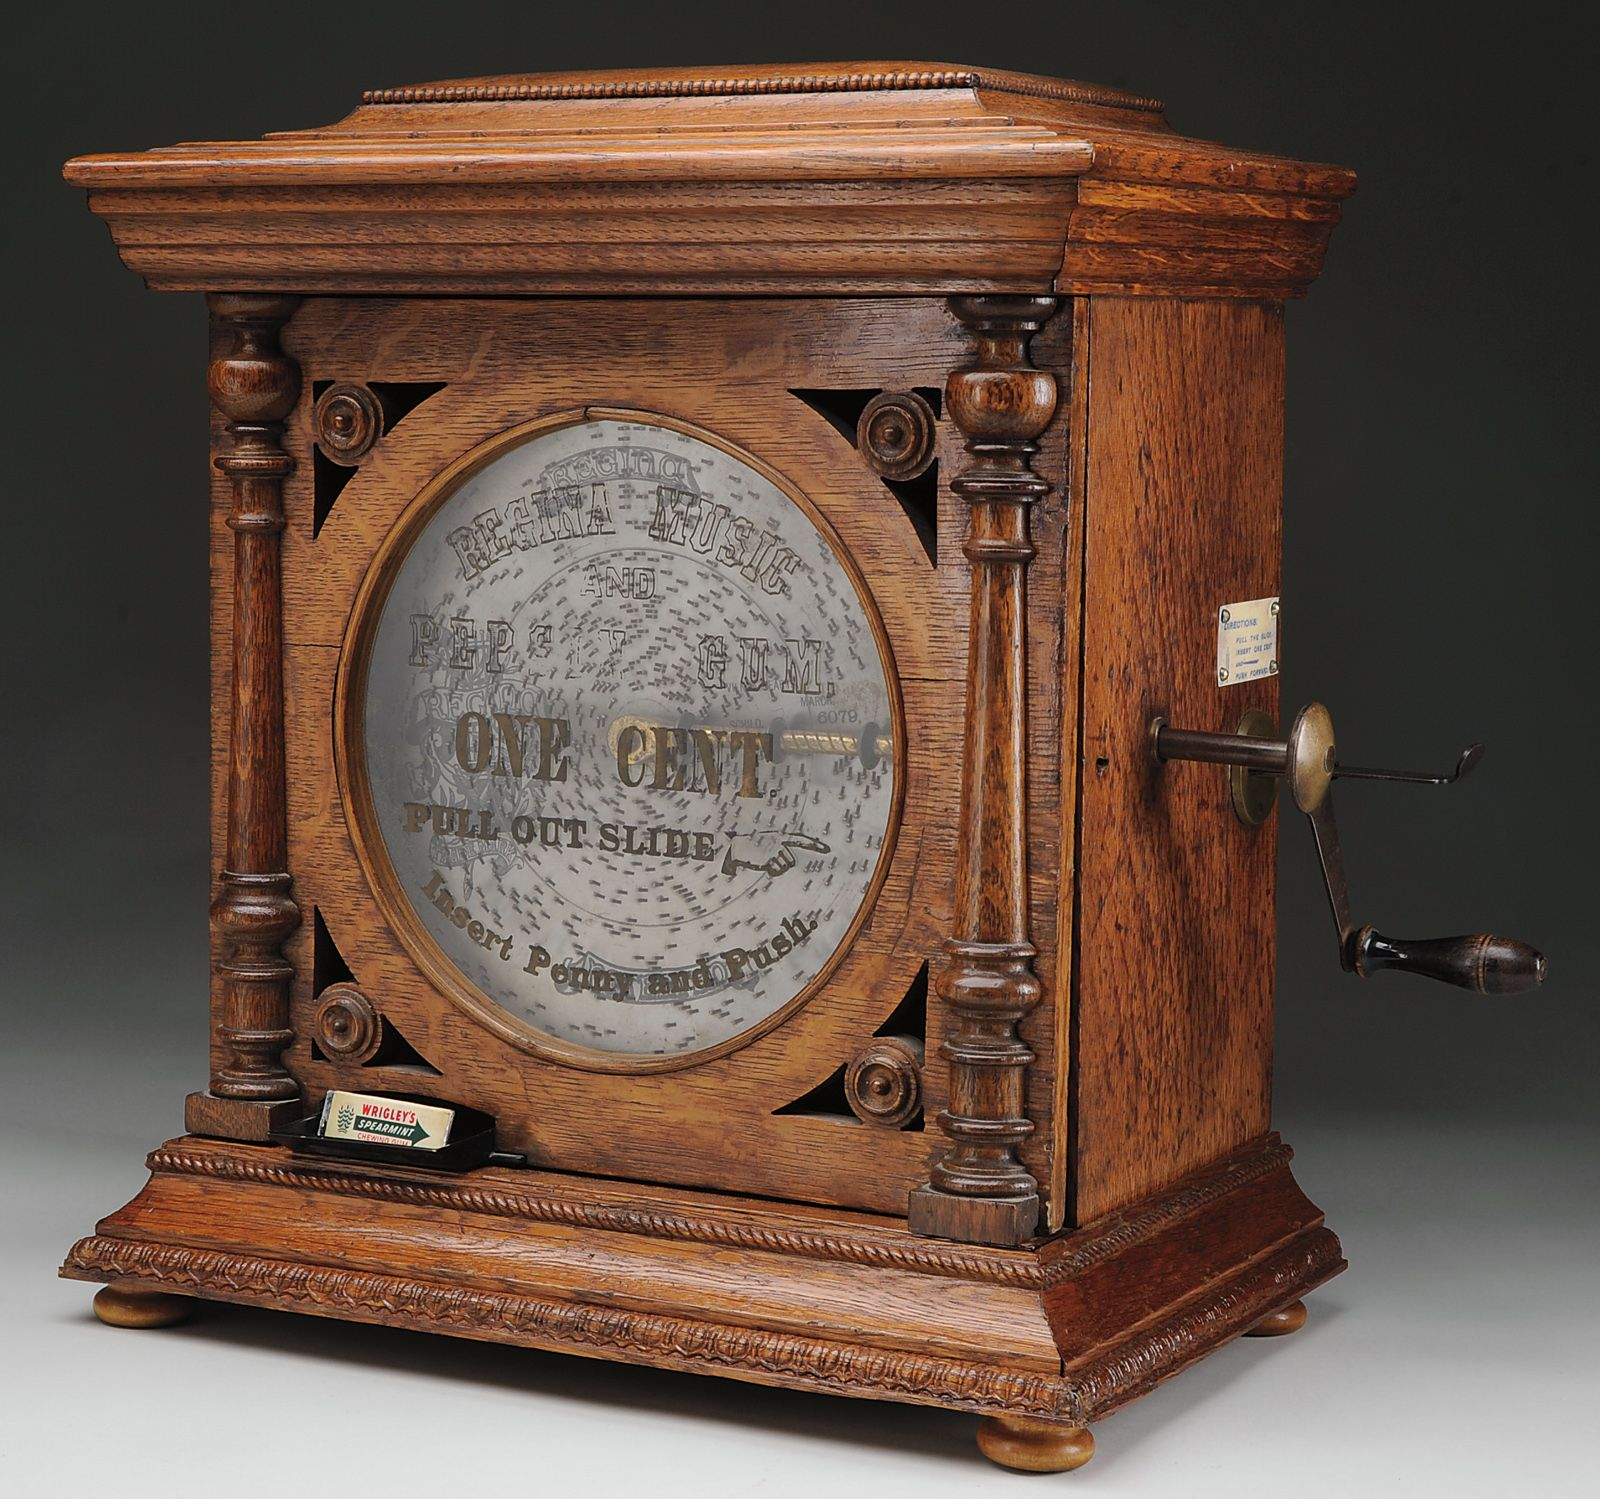 Regina Coin Operated Music Box Music Box Jewelry Antique Music